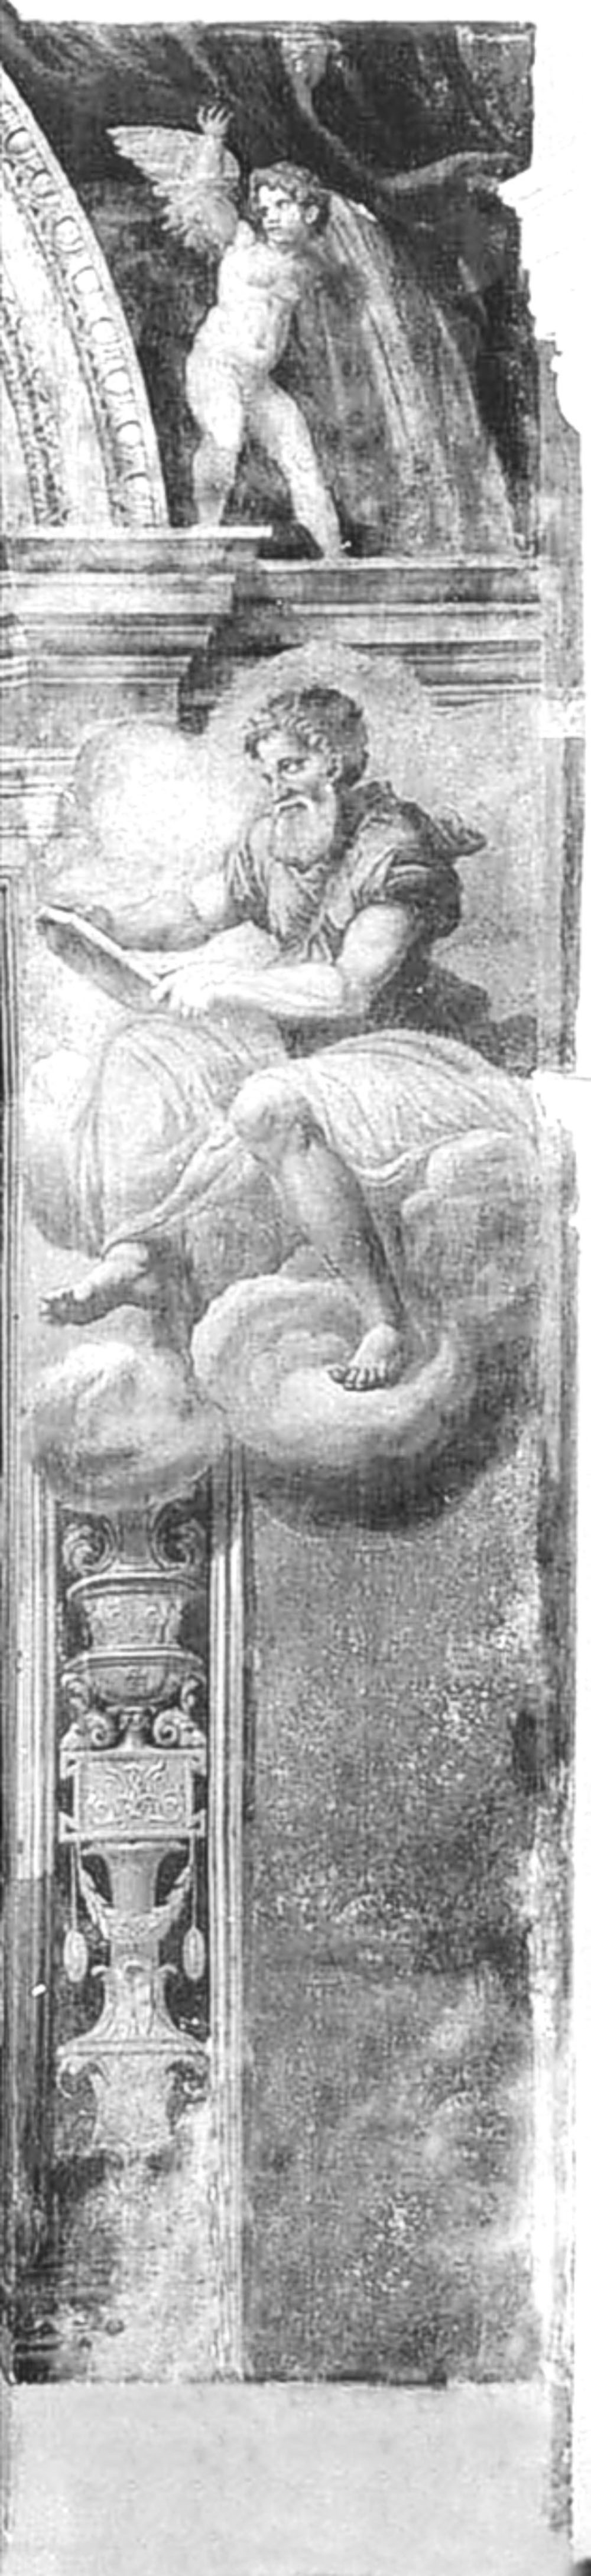 03a dettaglio affreschi dell'abside-profeta dx